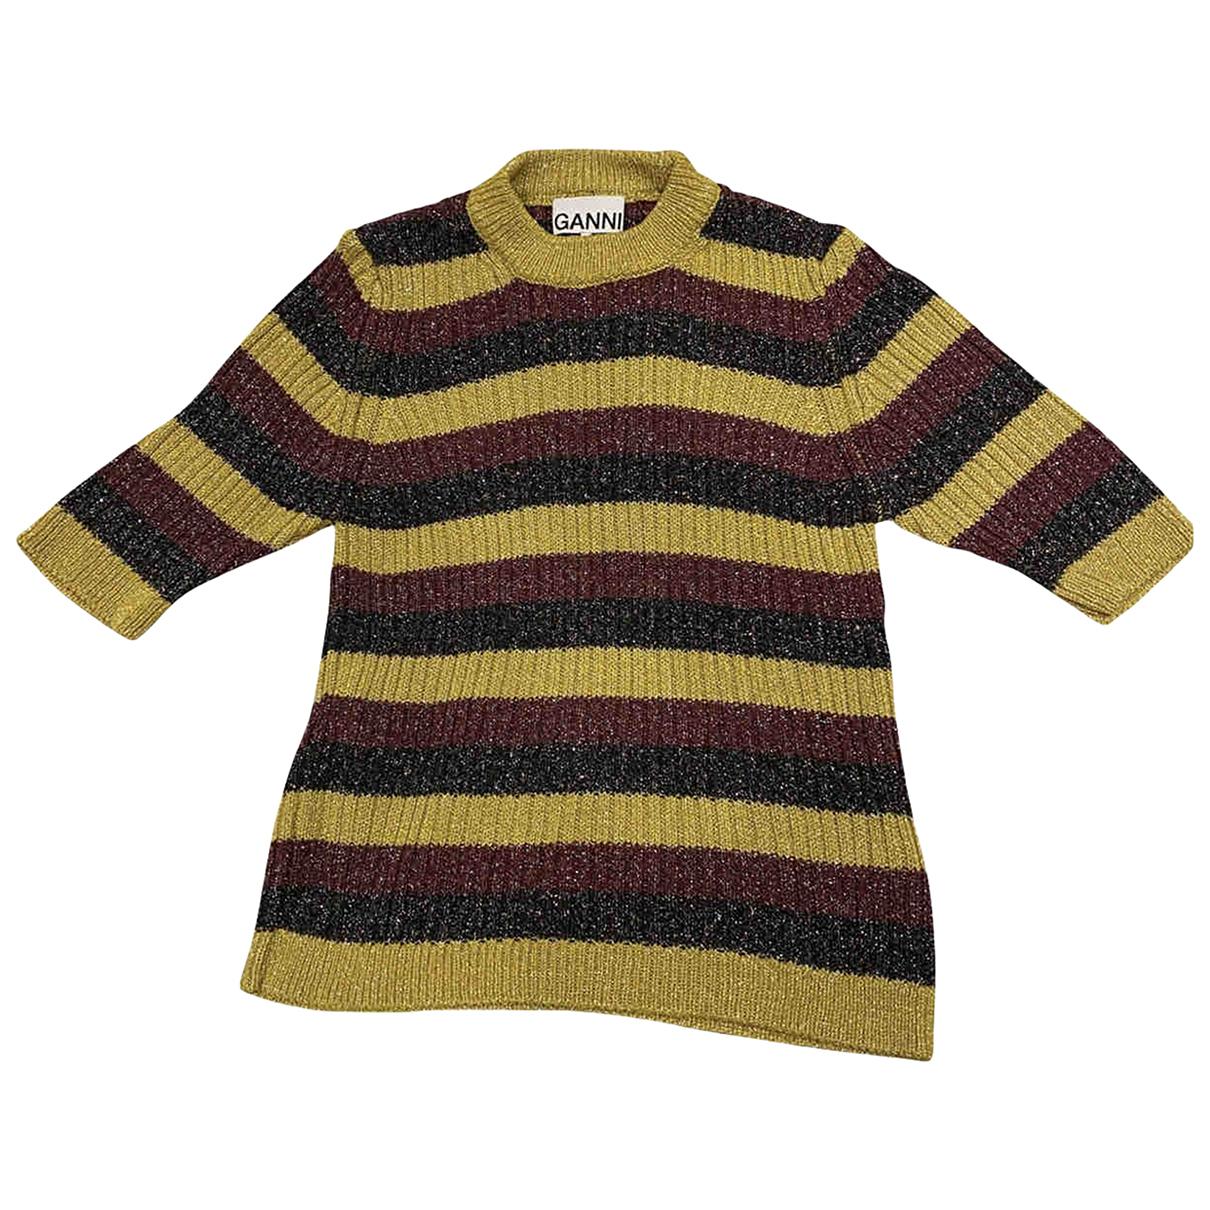 Ganni \N Yellow Knitwear for Women S International